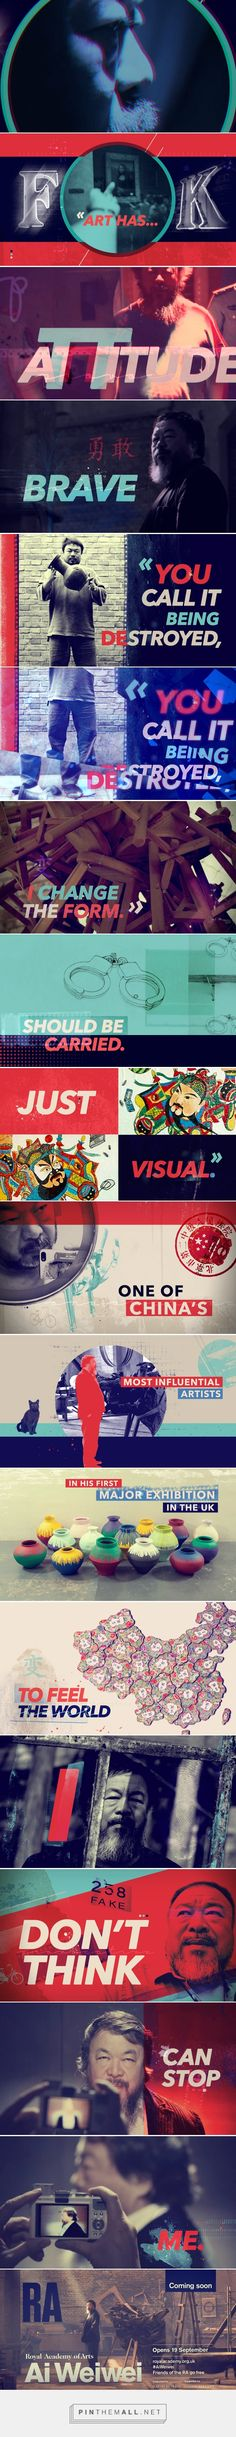 Royal Academy | Ai WeiWei Promo on Behance - created via http://pinthemall.net